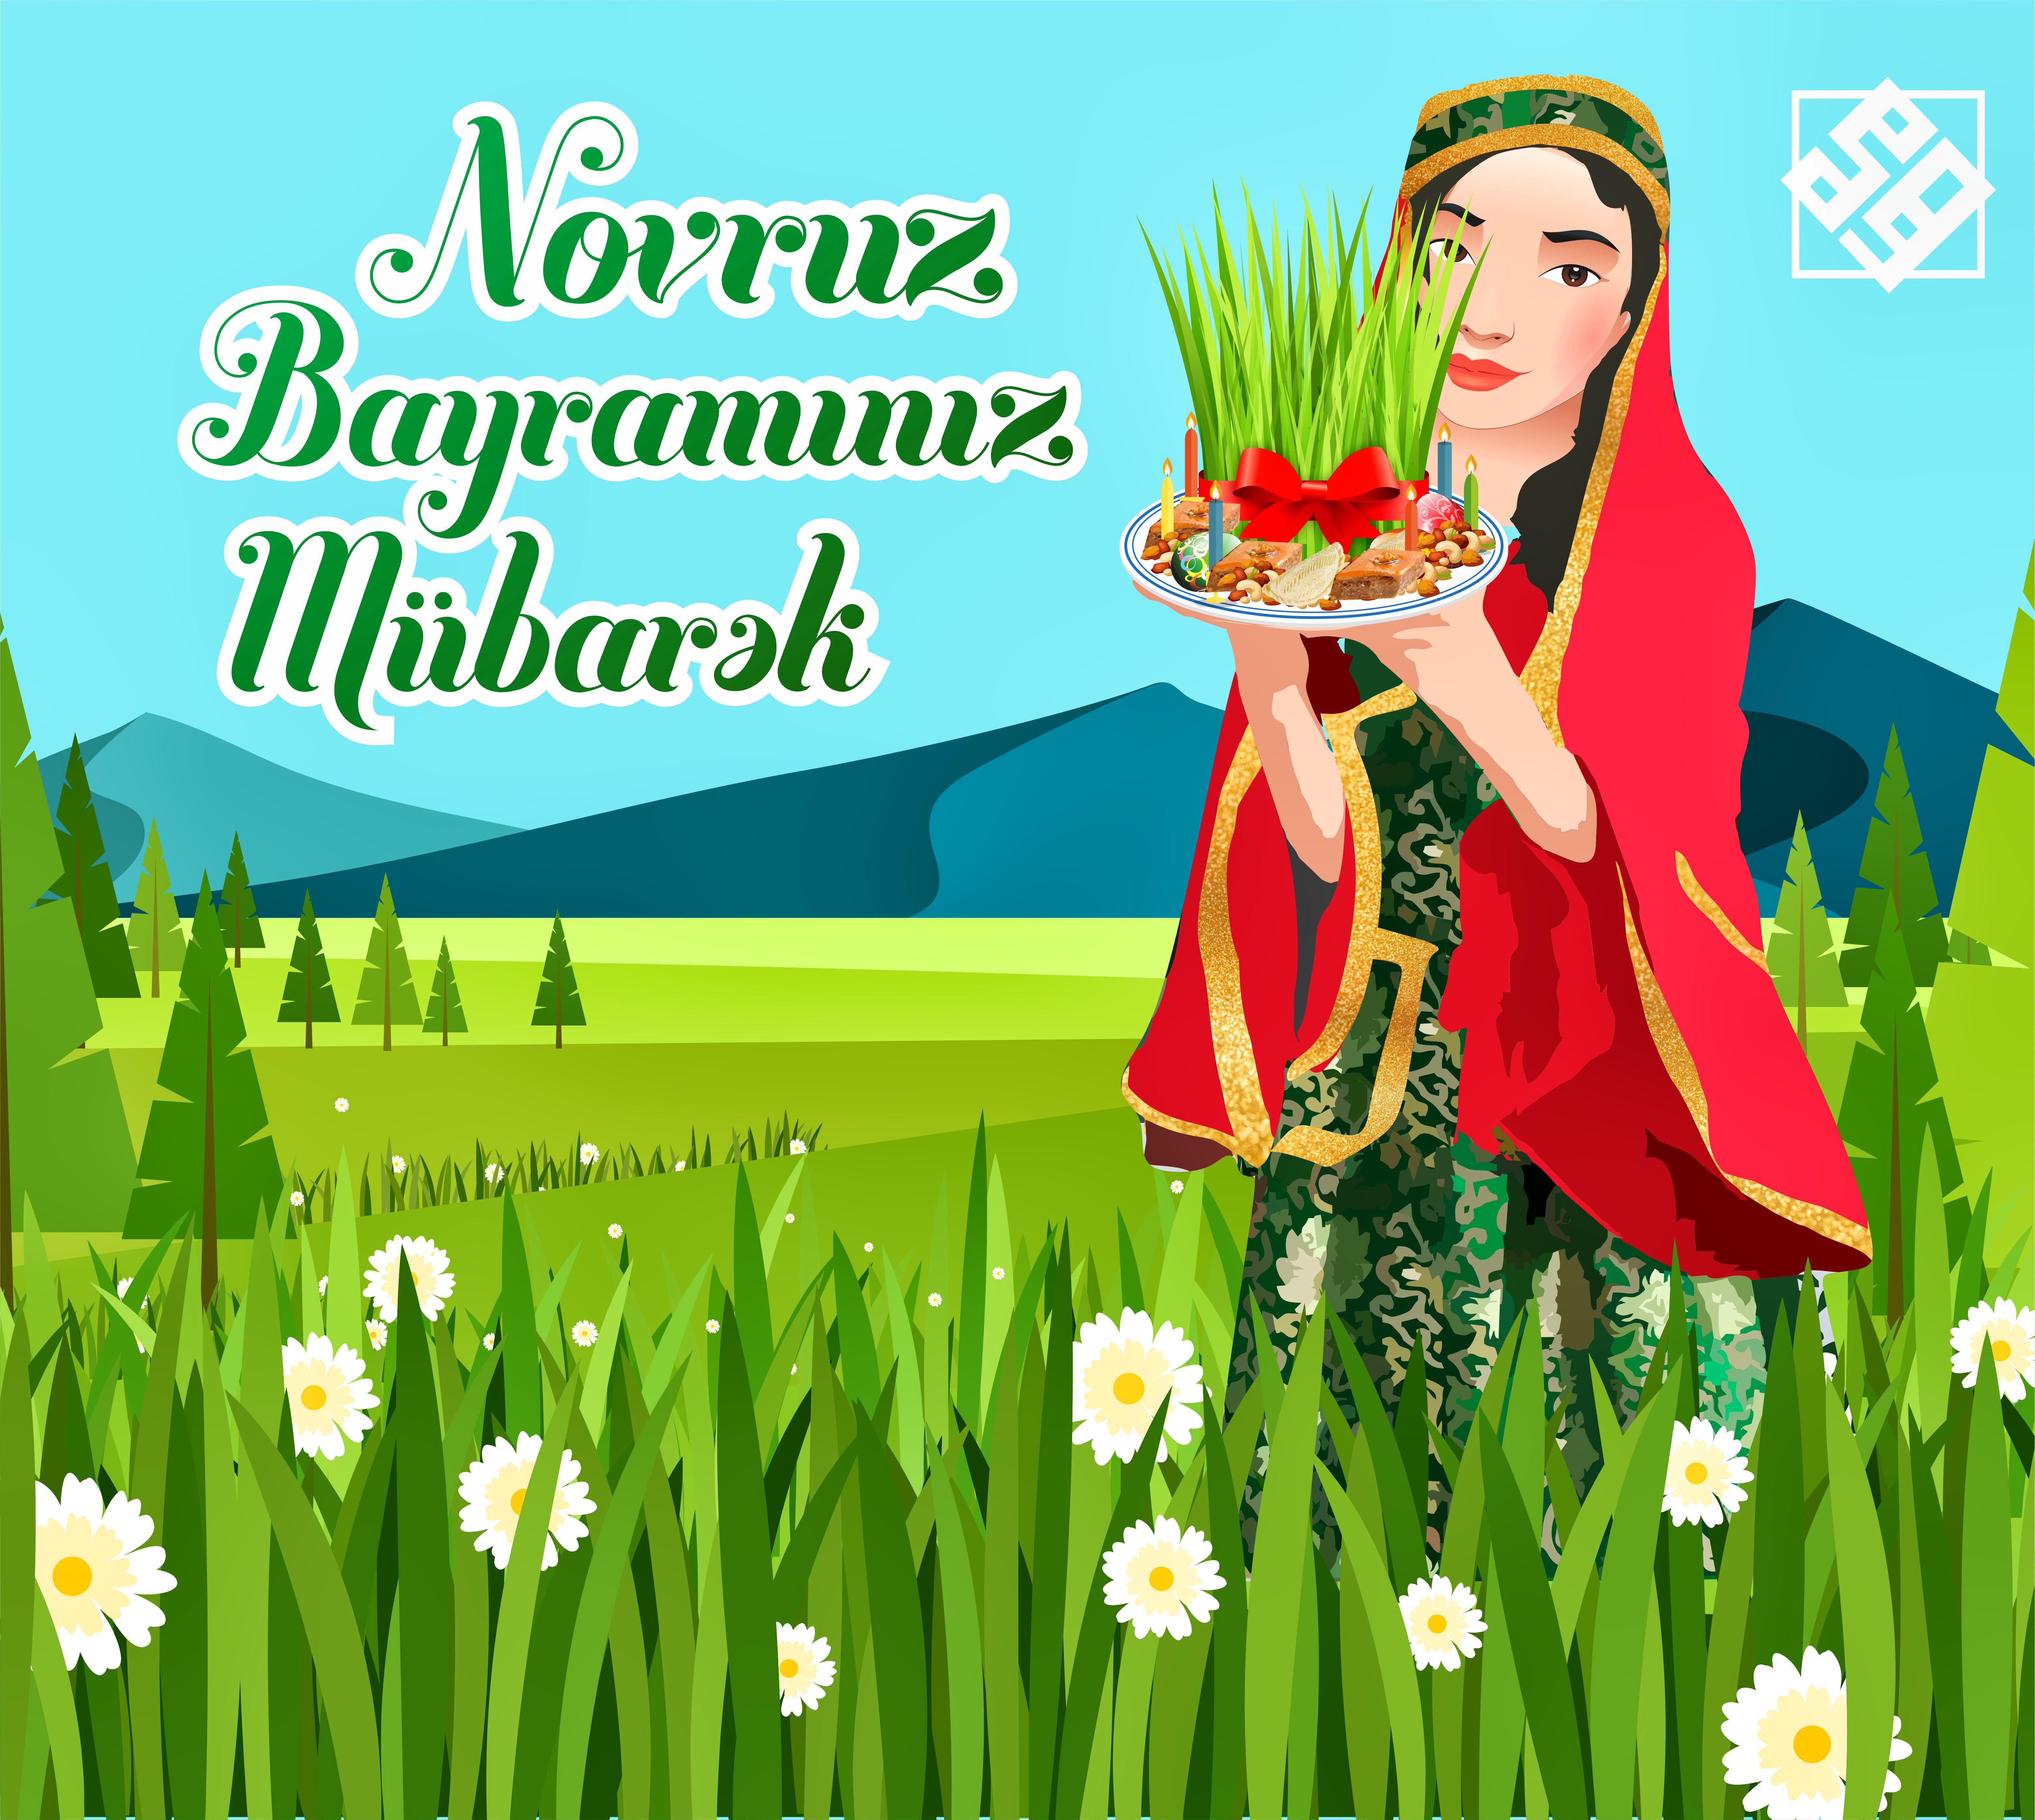 Oznakomtes S Moim Proektom Behance Novruz Bayraminiz Mubarək Https Www Behance Net Gallery 6323 Art Drawings Simple Graffiti Wallpaper Holiday Pictures